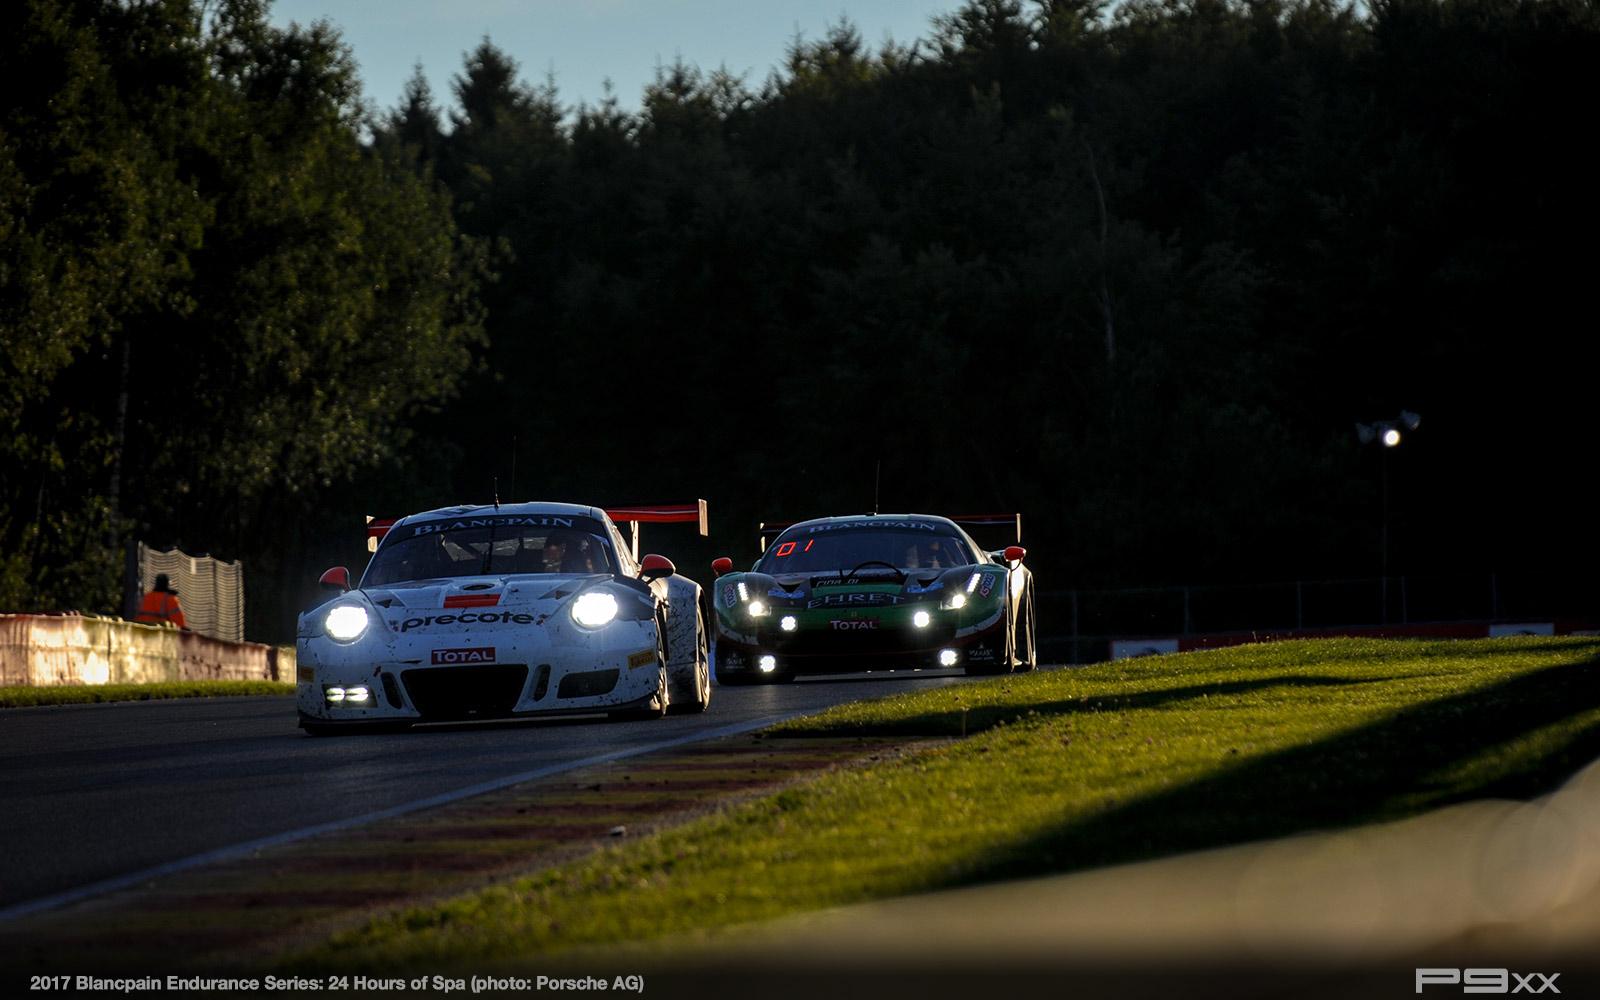 2017-24-Hours-of-Spa-Porsche-374